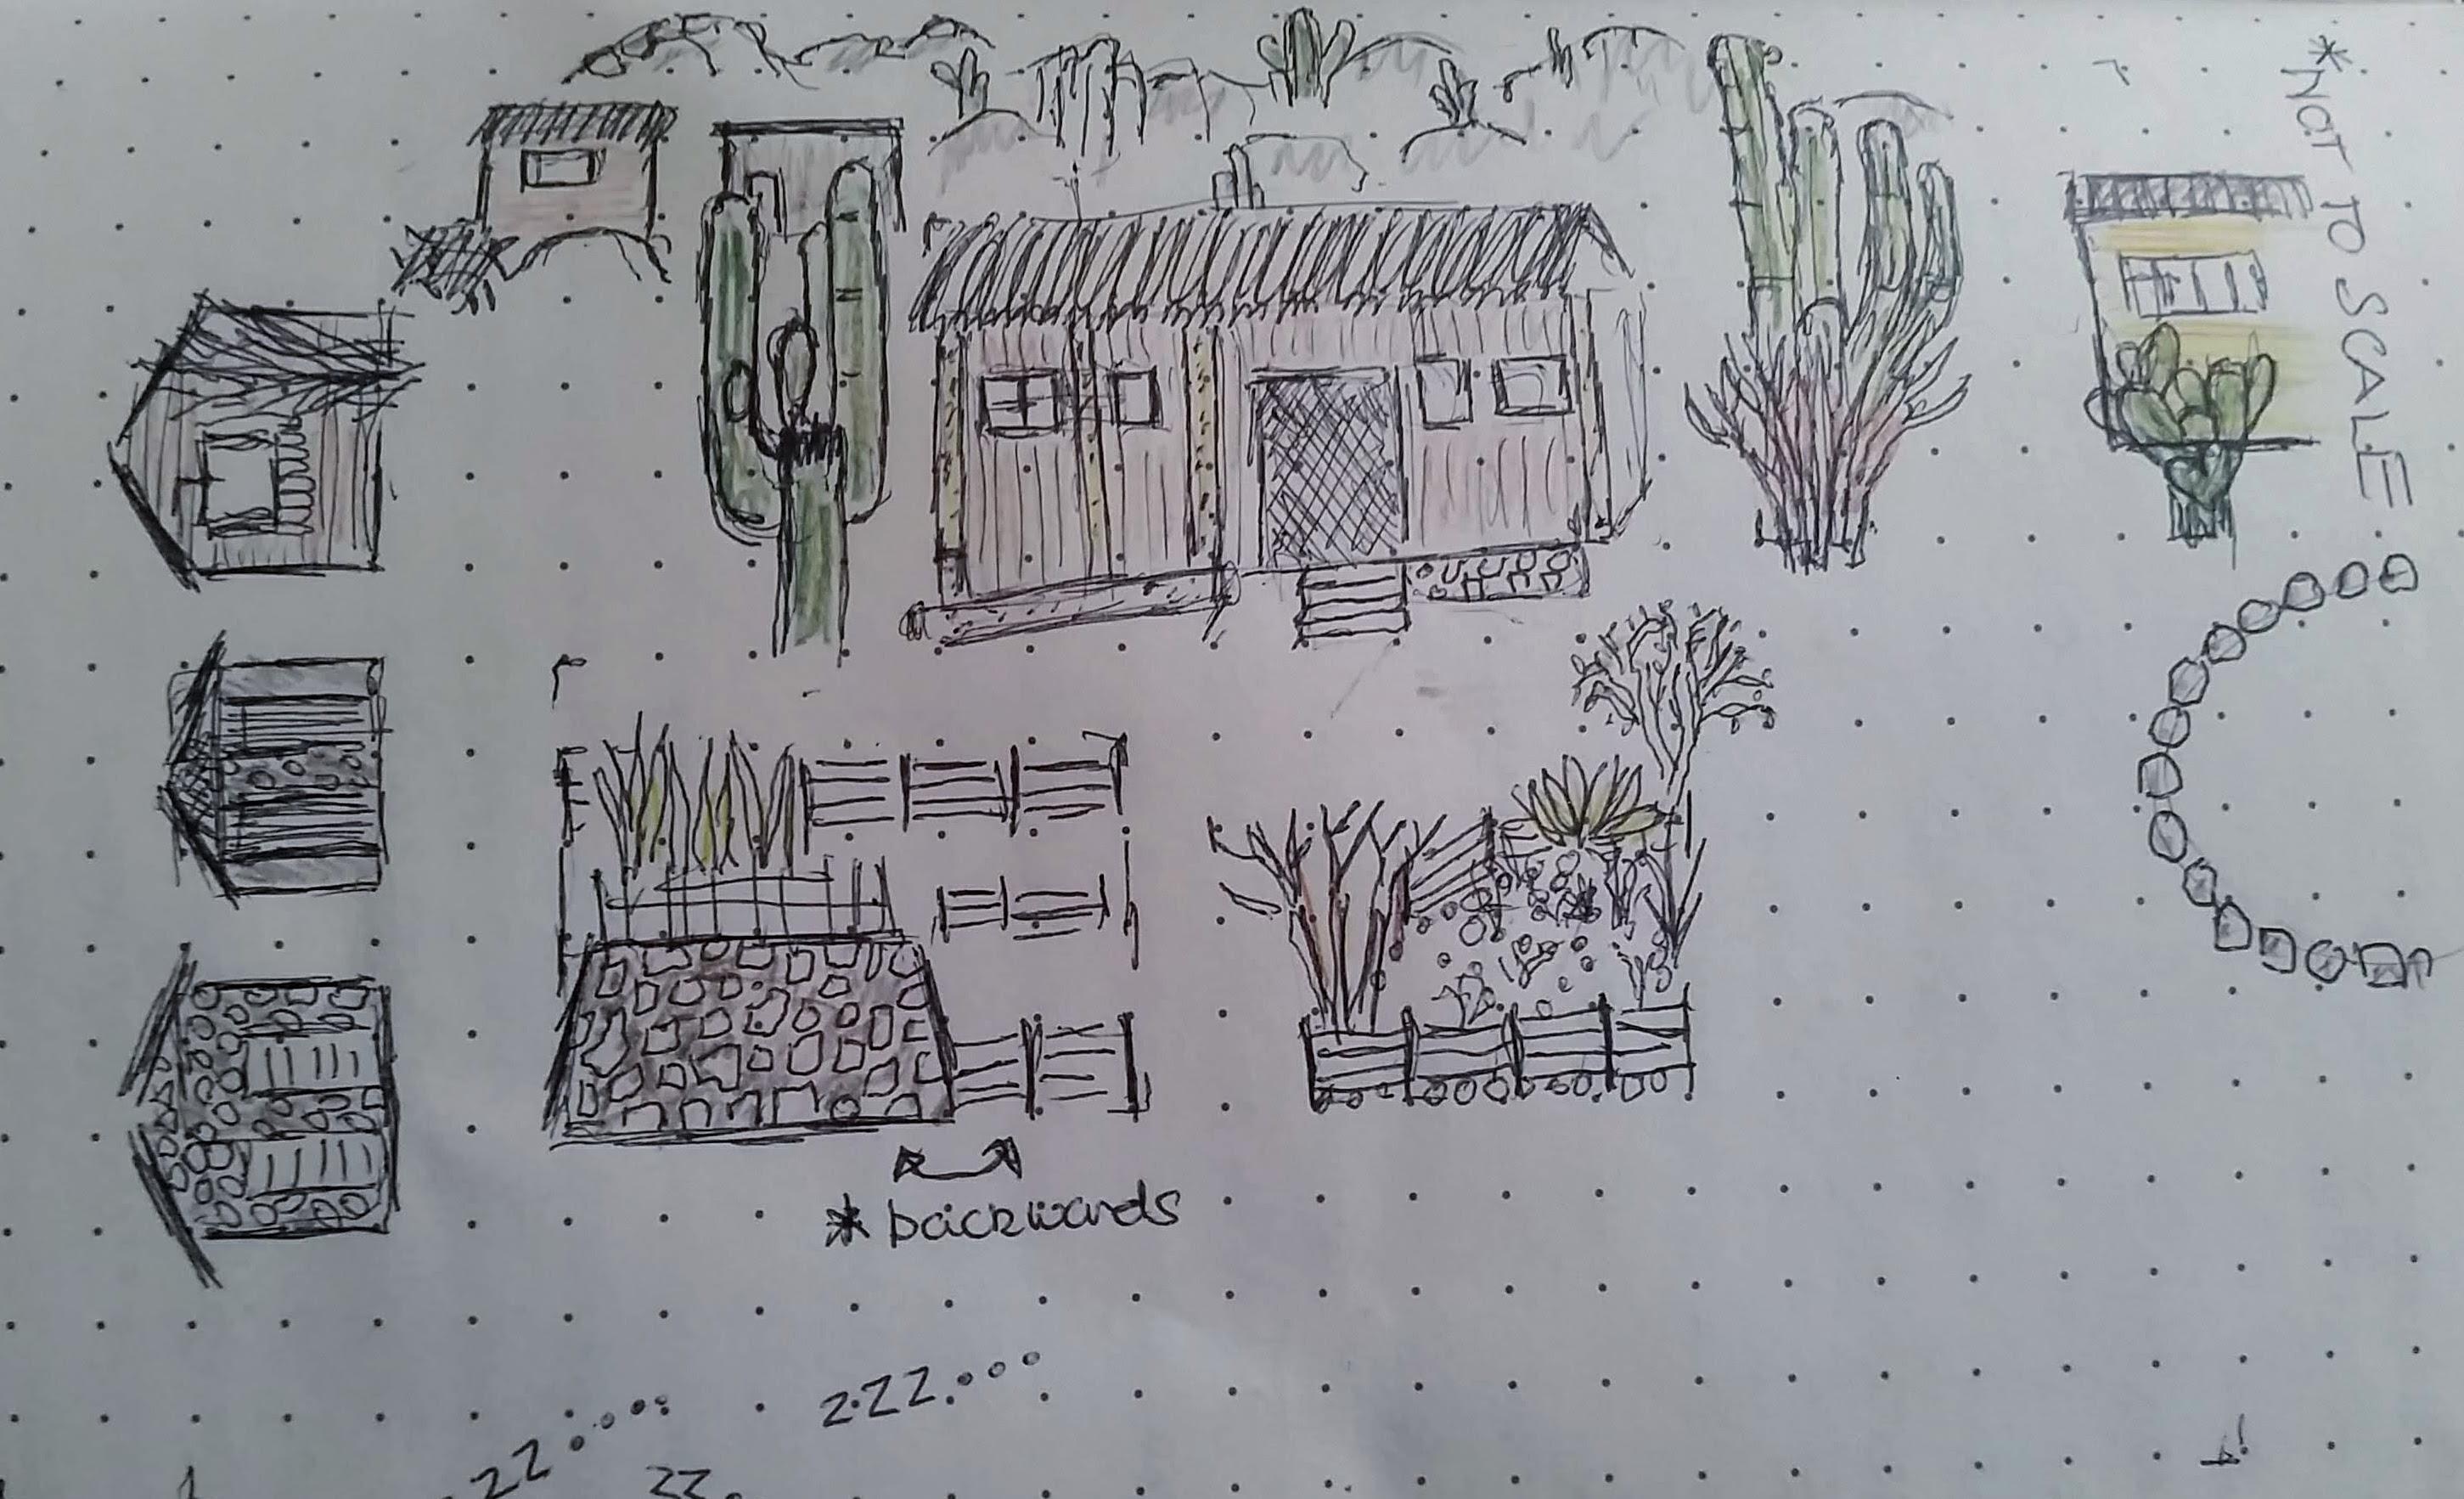 photo of hand-drawn map